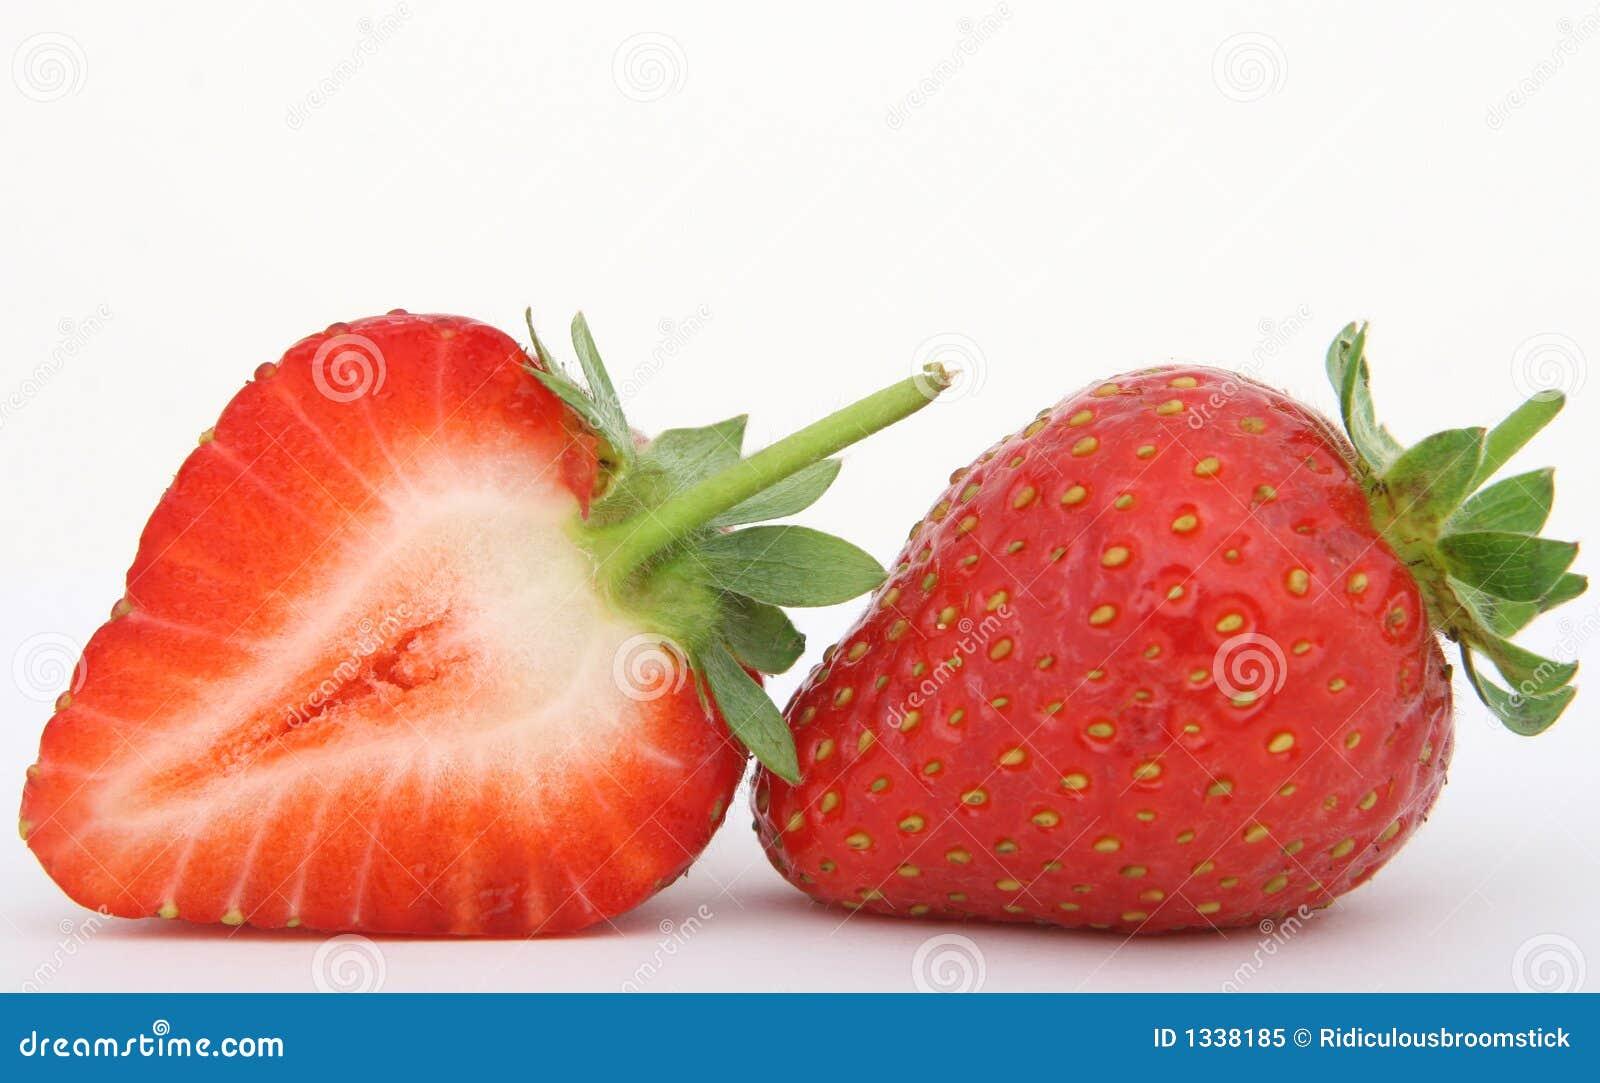 Sliced red strawberry fruit